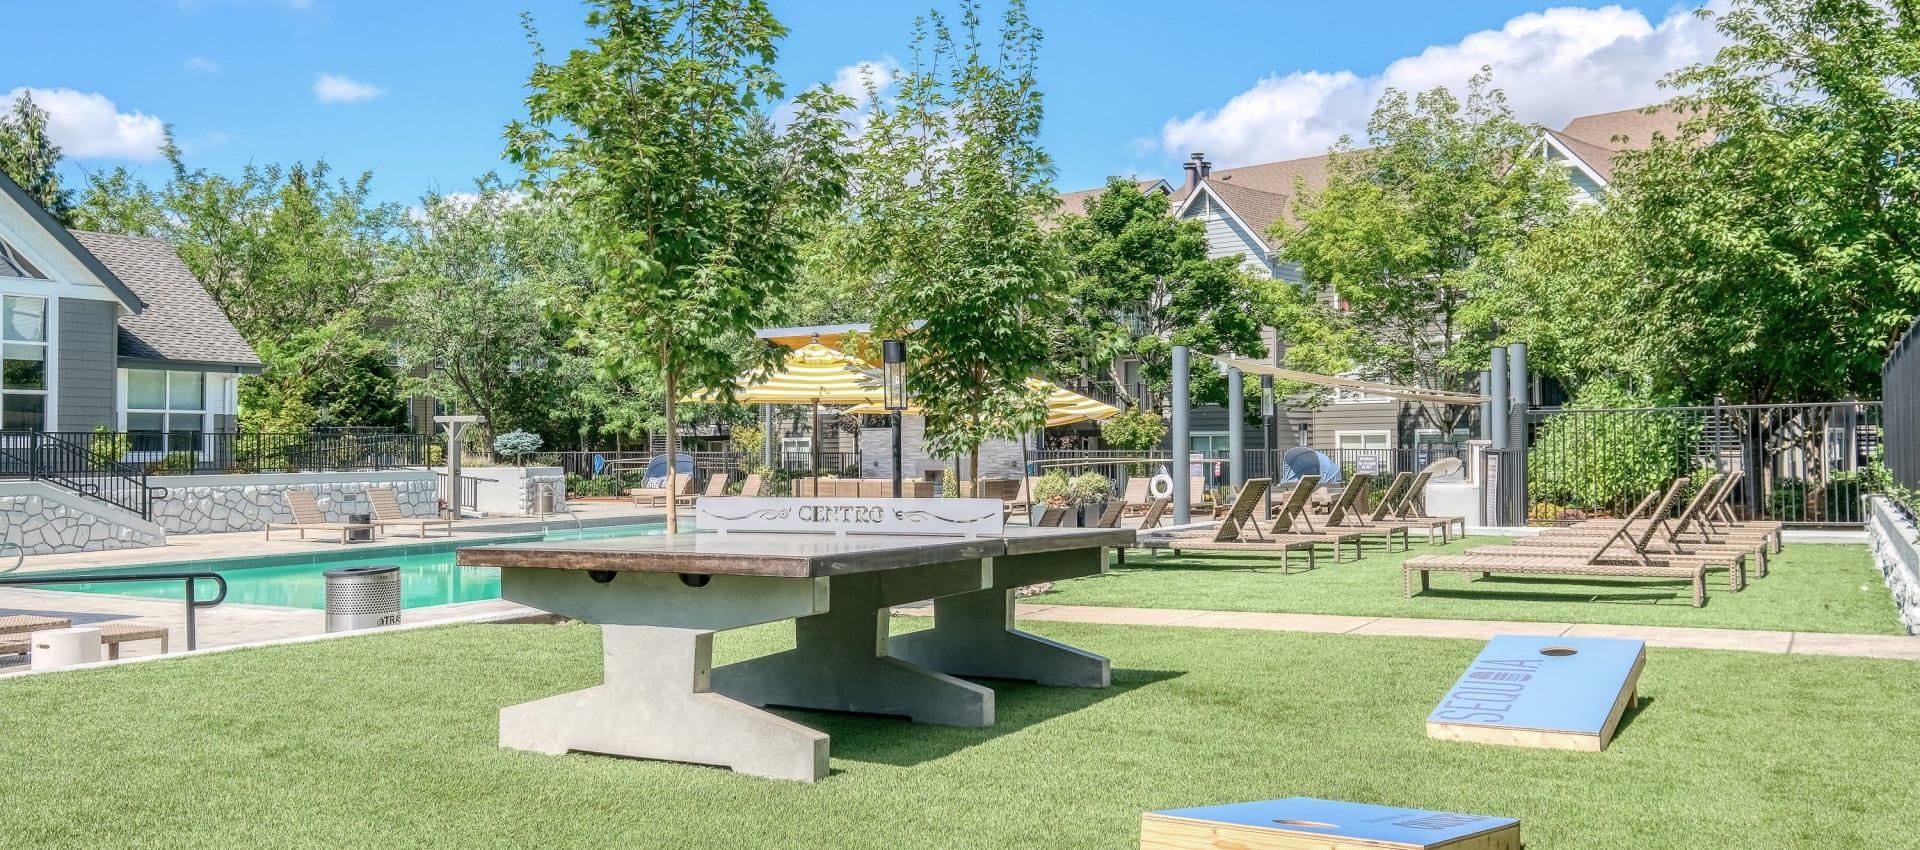 Outdoor activity area at Centro Apartment Homes in Hillsboro, Oregon